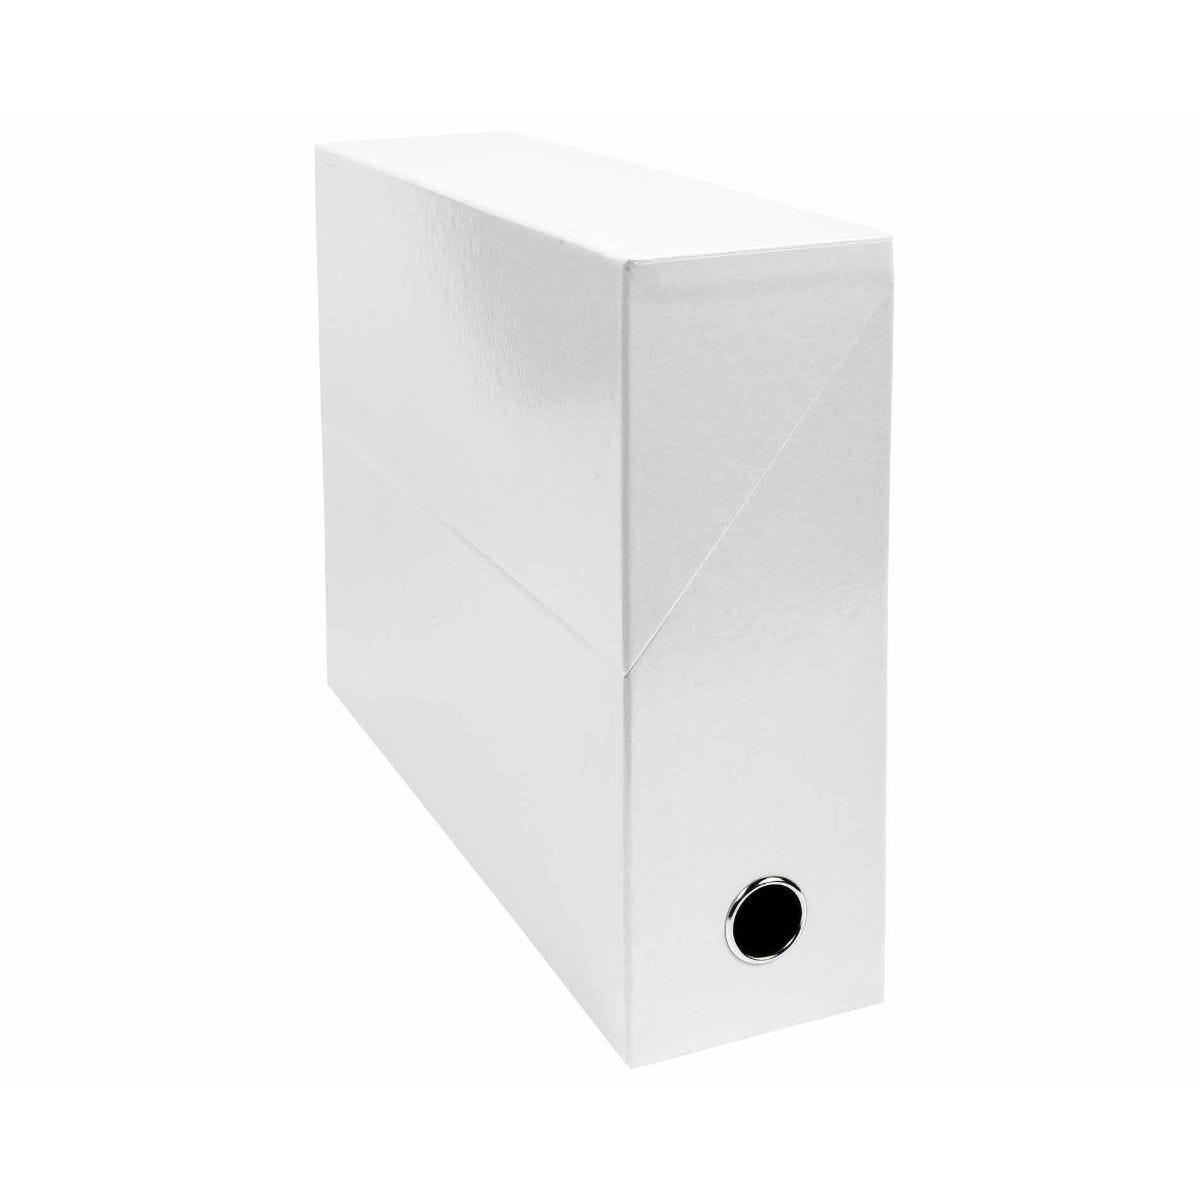 Exacompta Iderama Filing Box 90mm Pack of 5 white